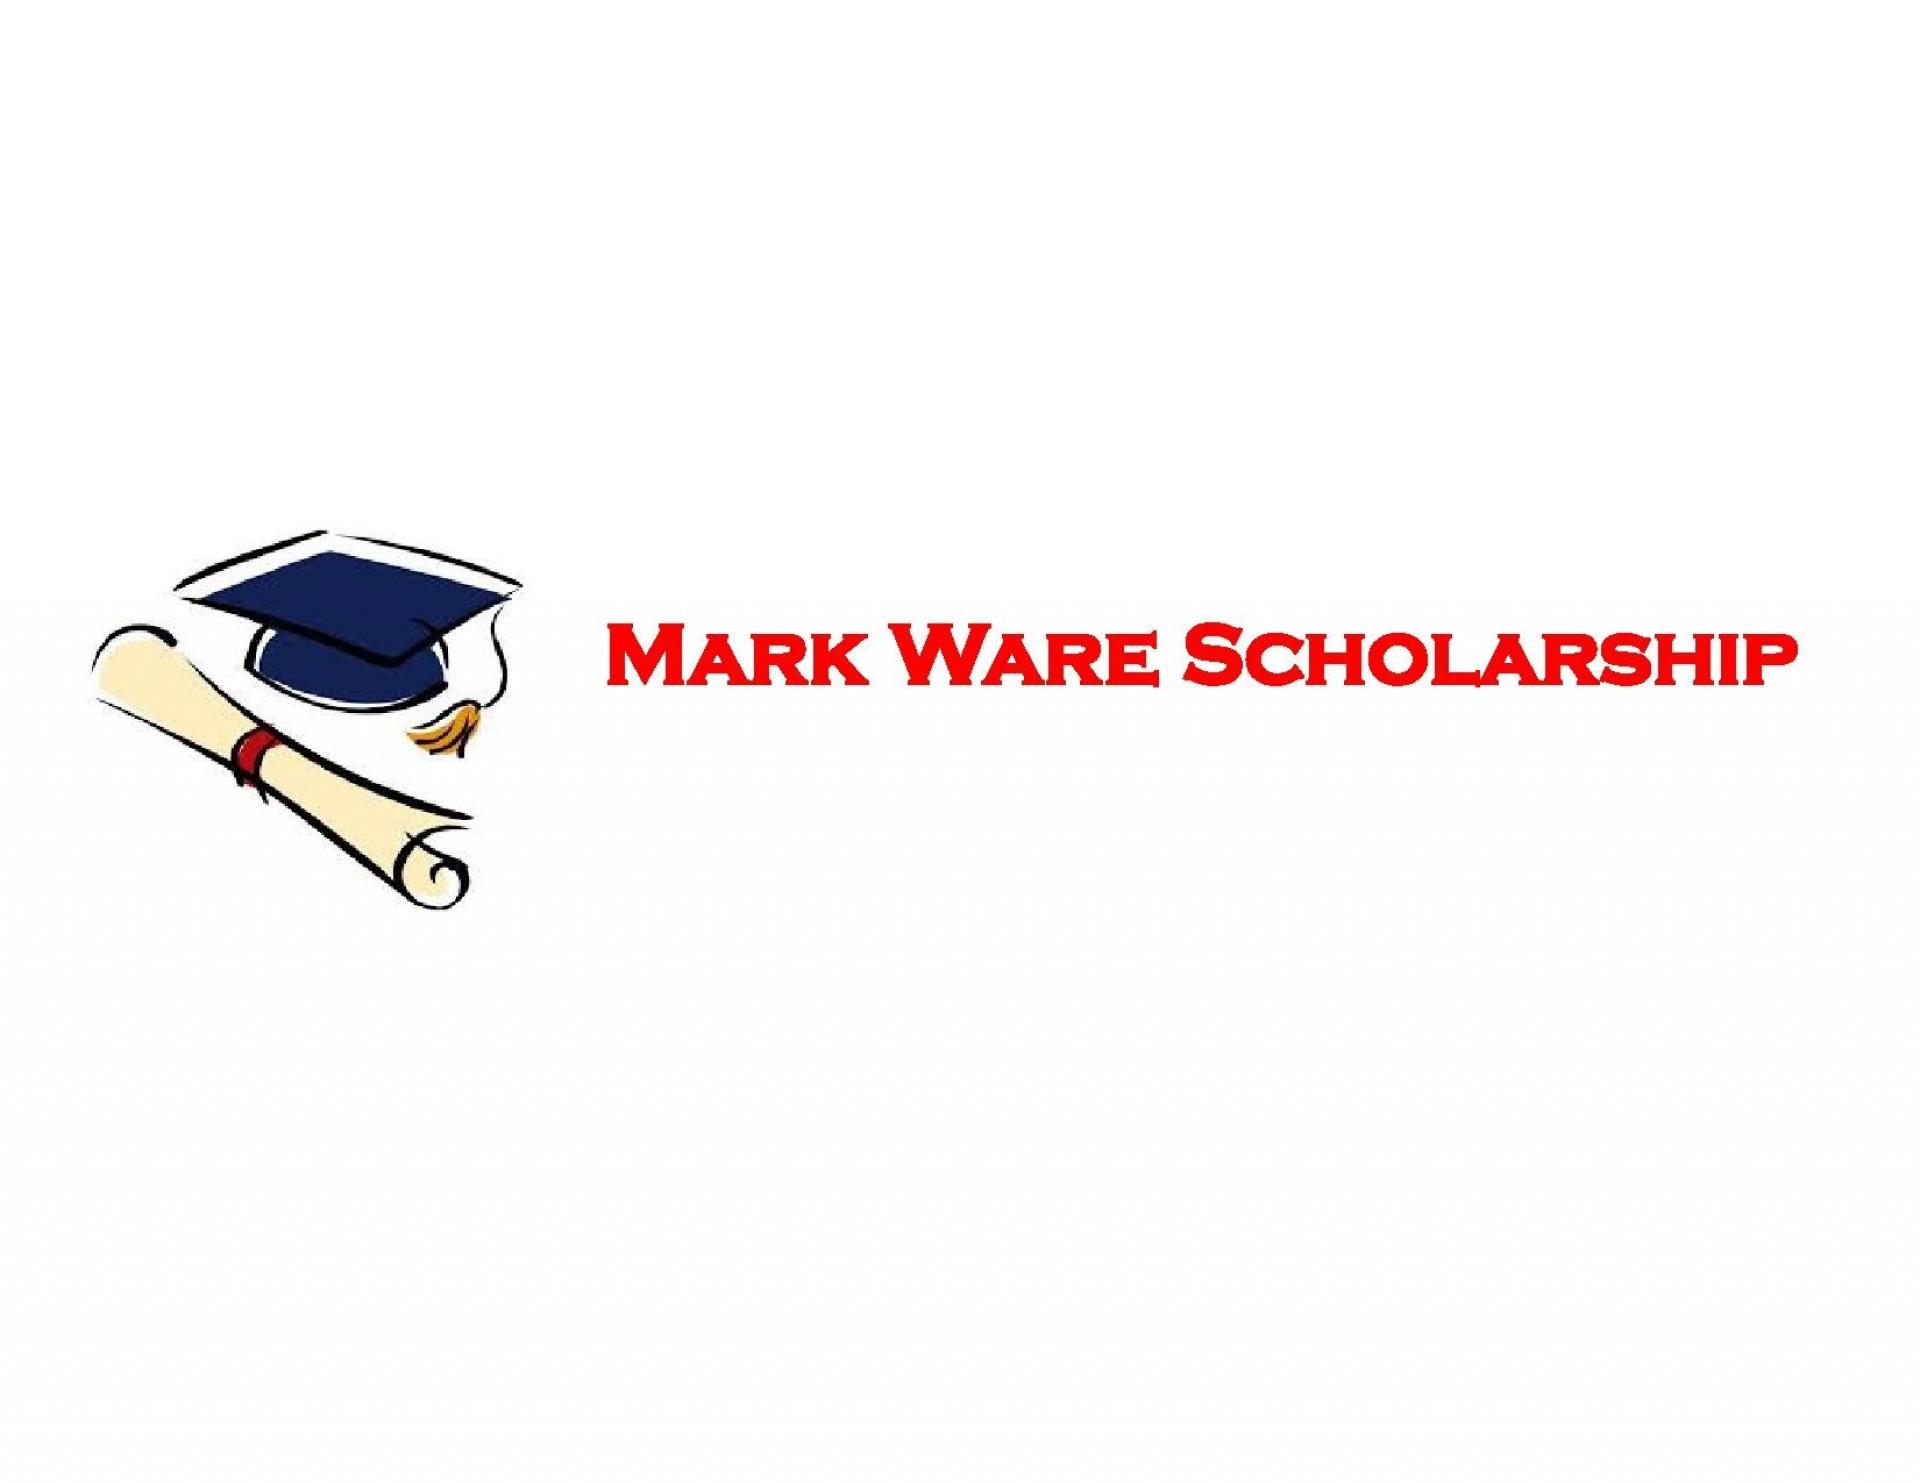 019 Essay Example Scholarship Prompts Wv Mark Ware Construction Magnificent Robertson 2018-19 Vanderbilt Washington And Lee Johnson 1920